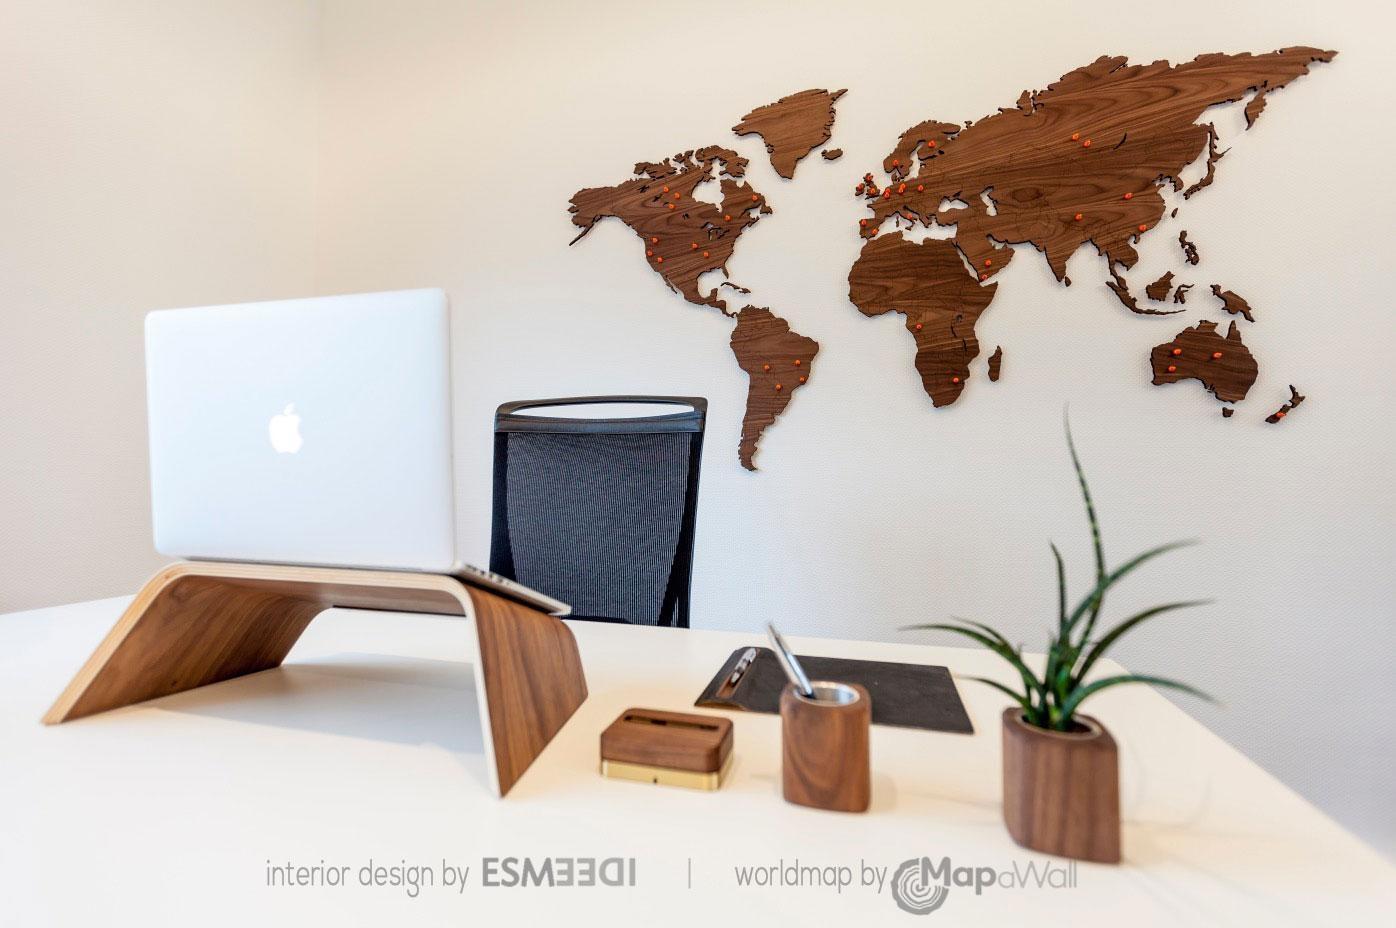 World Map Walnut – Mapawall For Wooden World Map Wall Art (View 4 of 20)